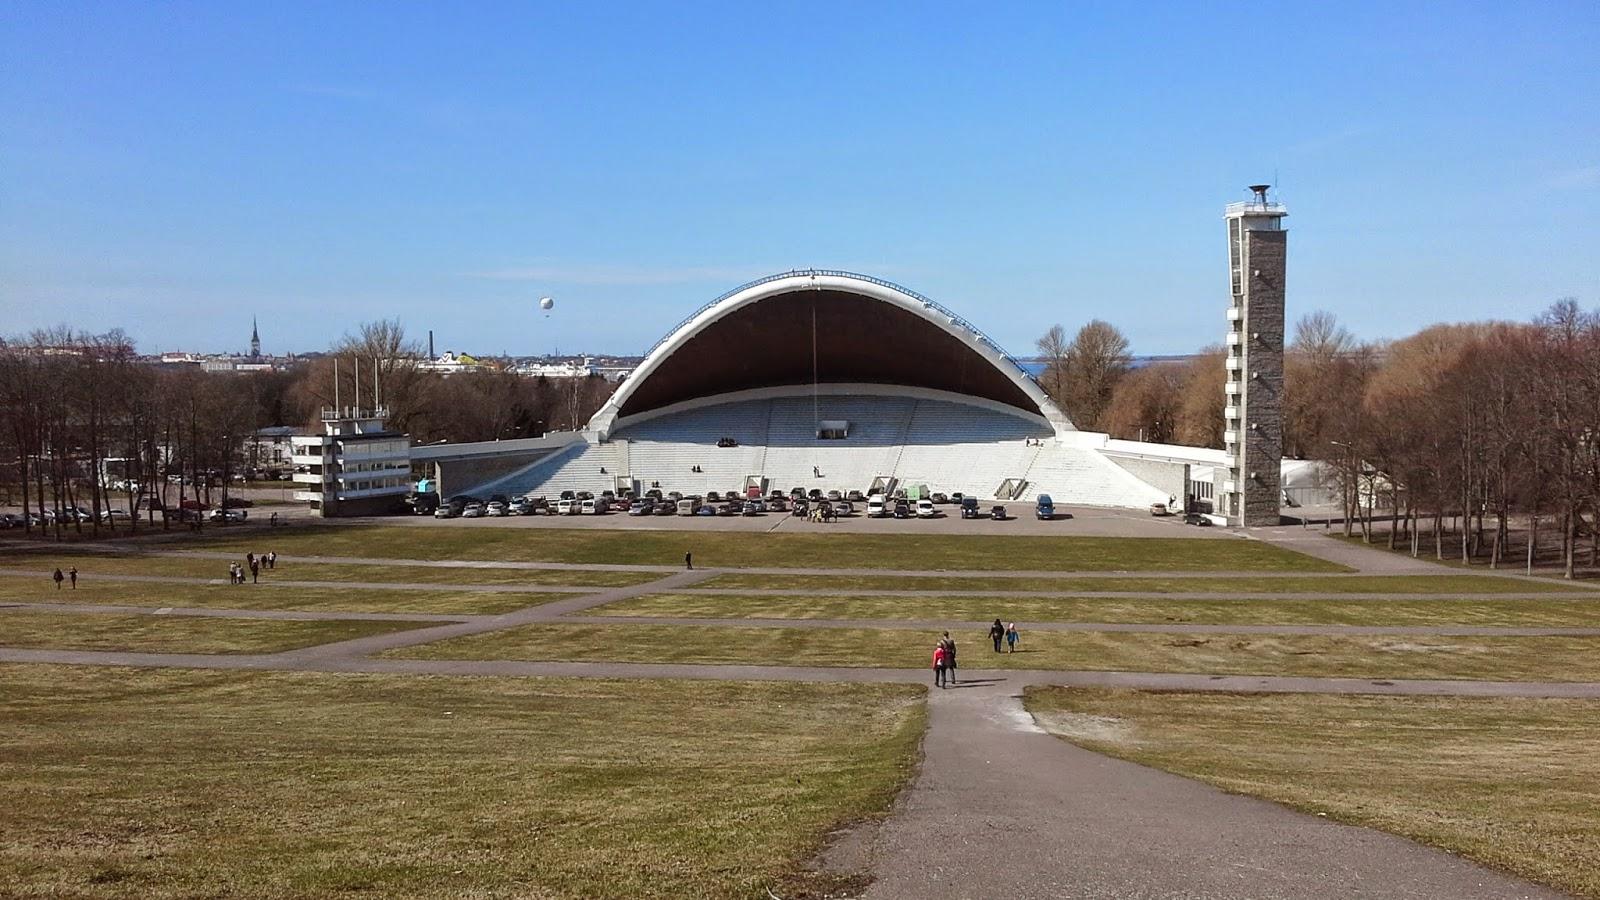 Song Festival Grounds in Tallinn - photo Robert Hugill